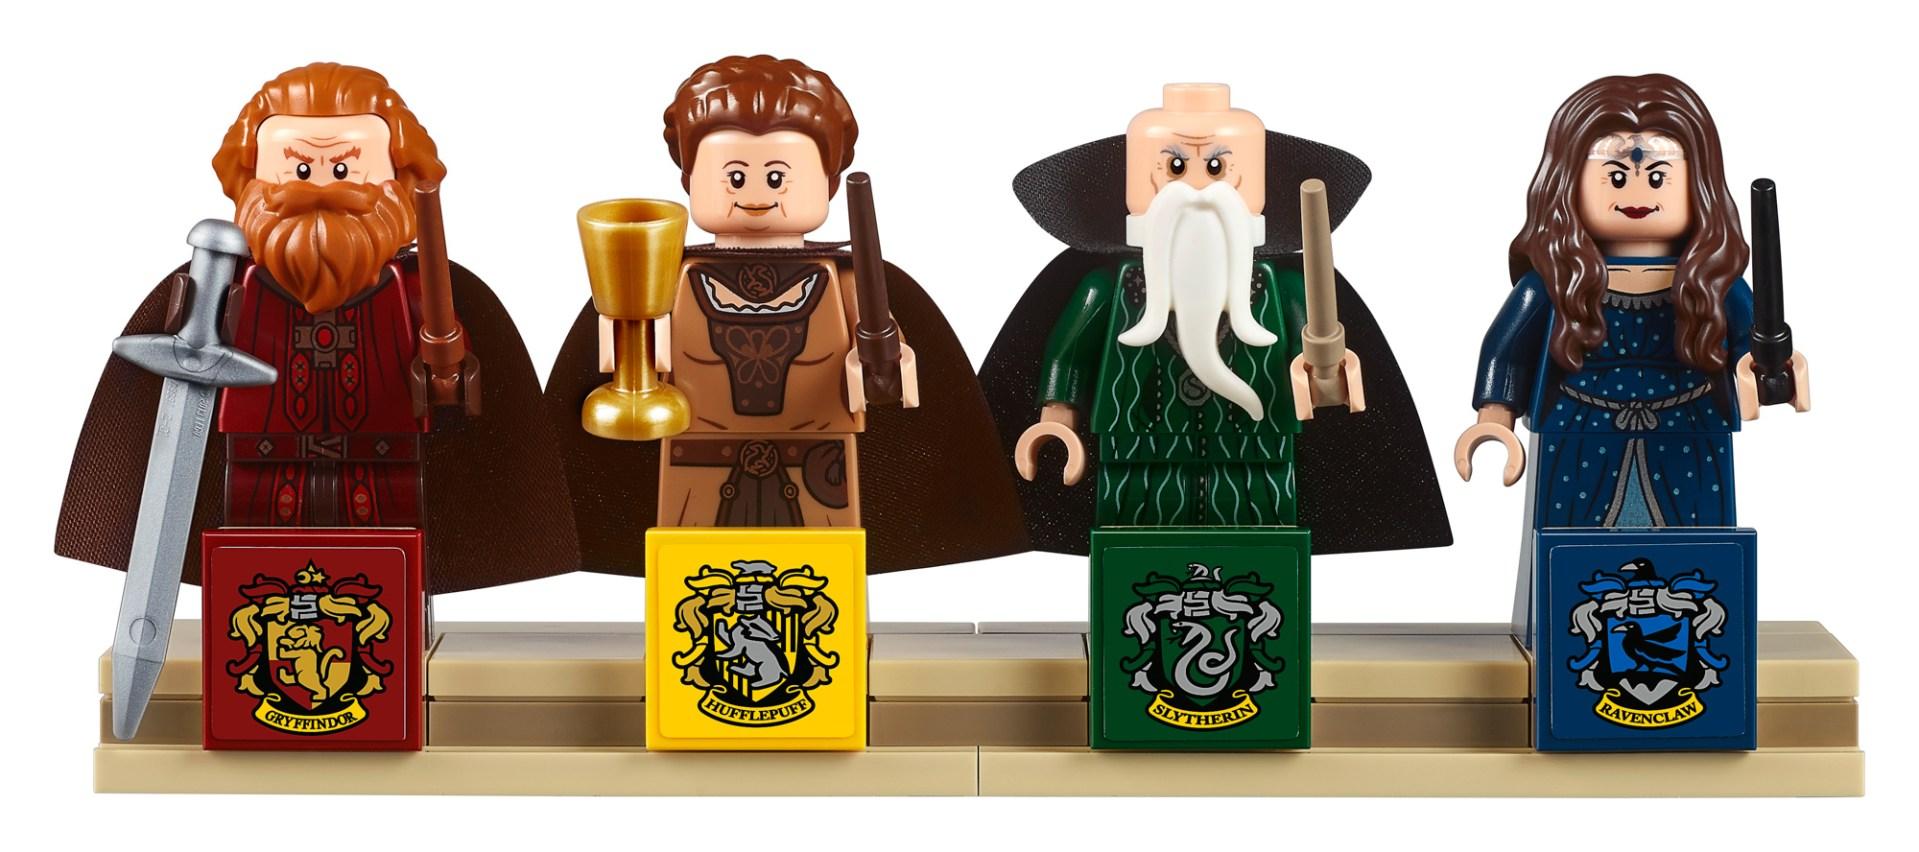 71043-Harry-Potter-Hogwarts-Castle-33.jpg